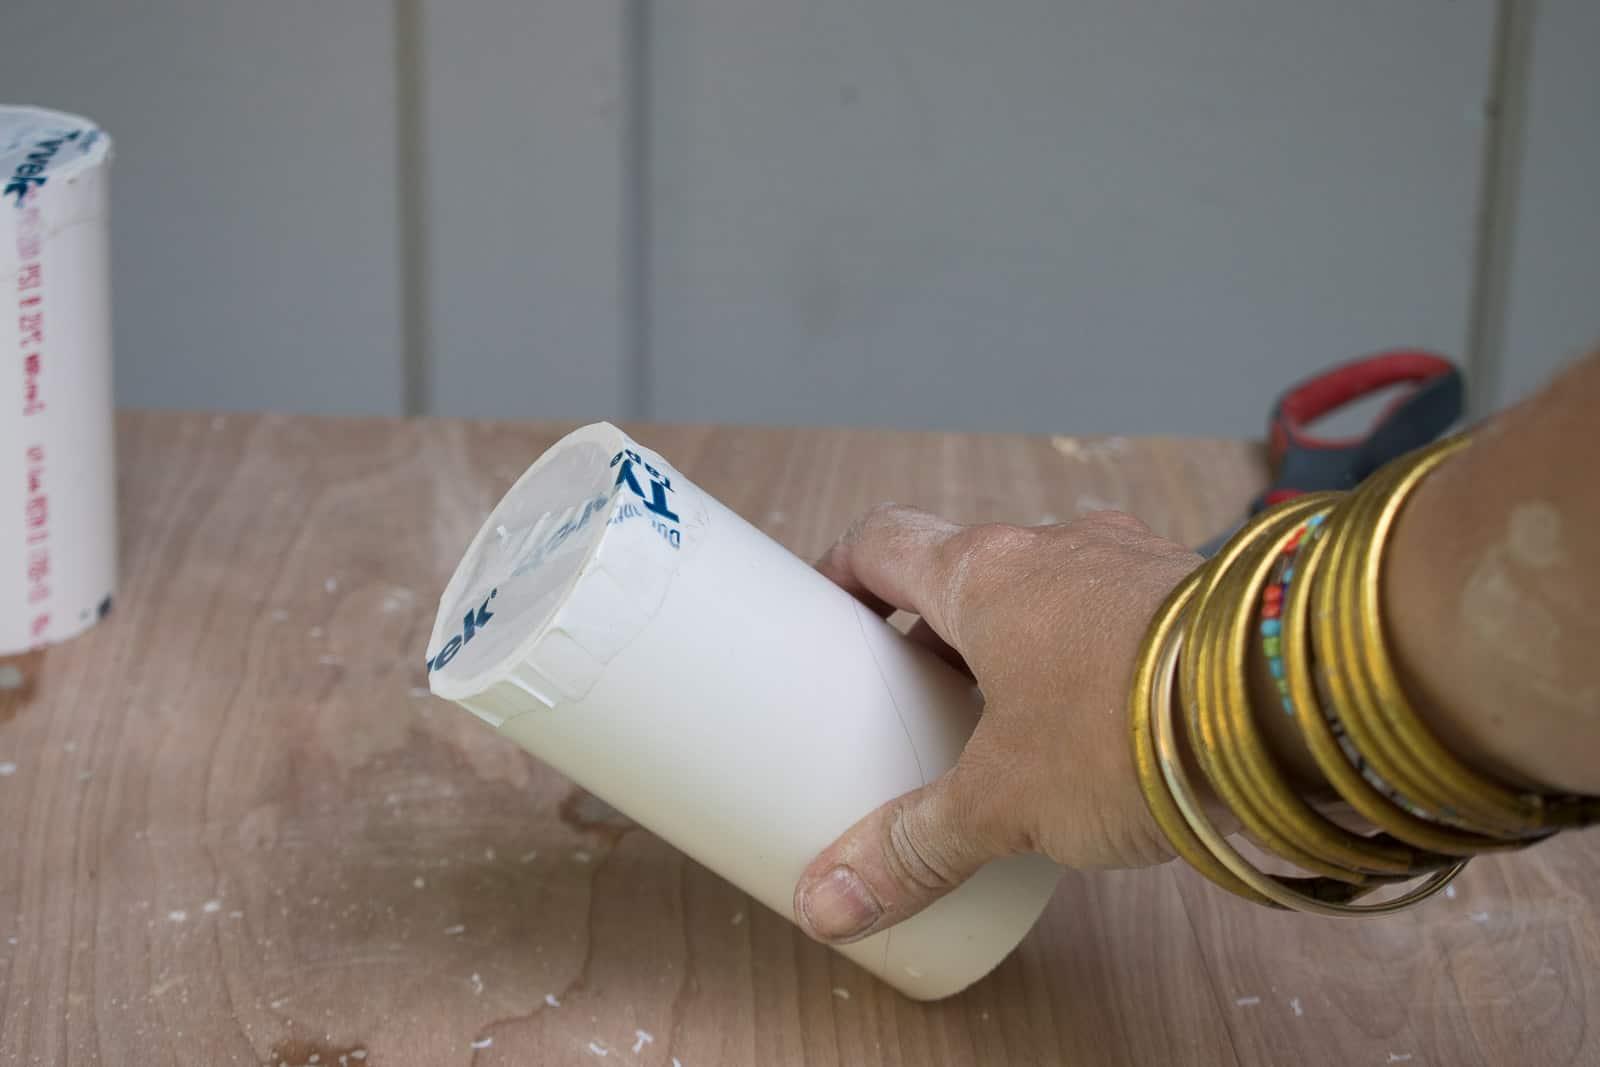 Tyvek tape on a PVC pipe